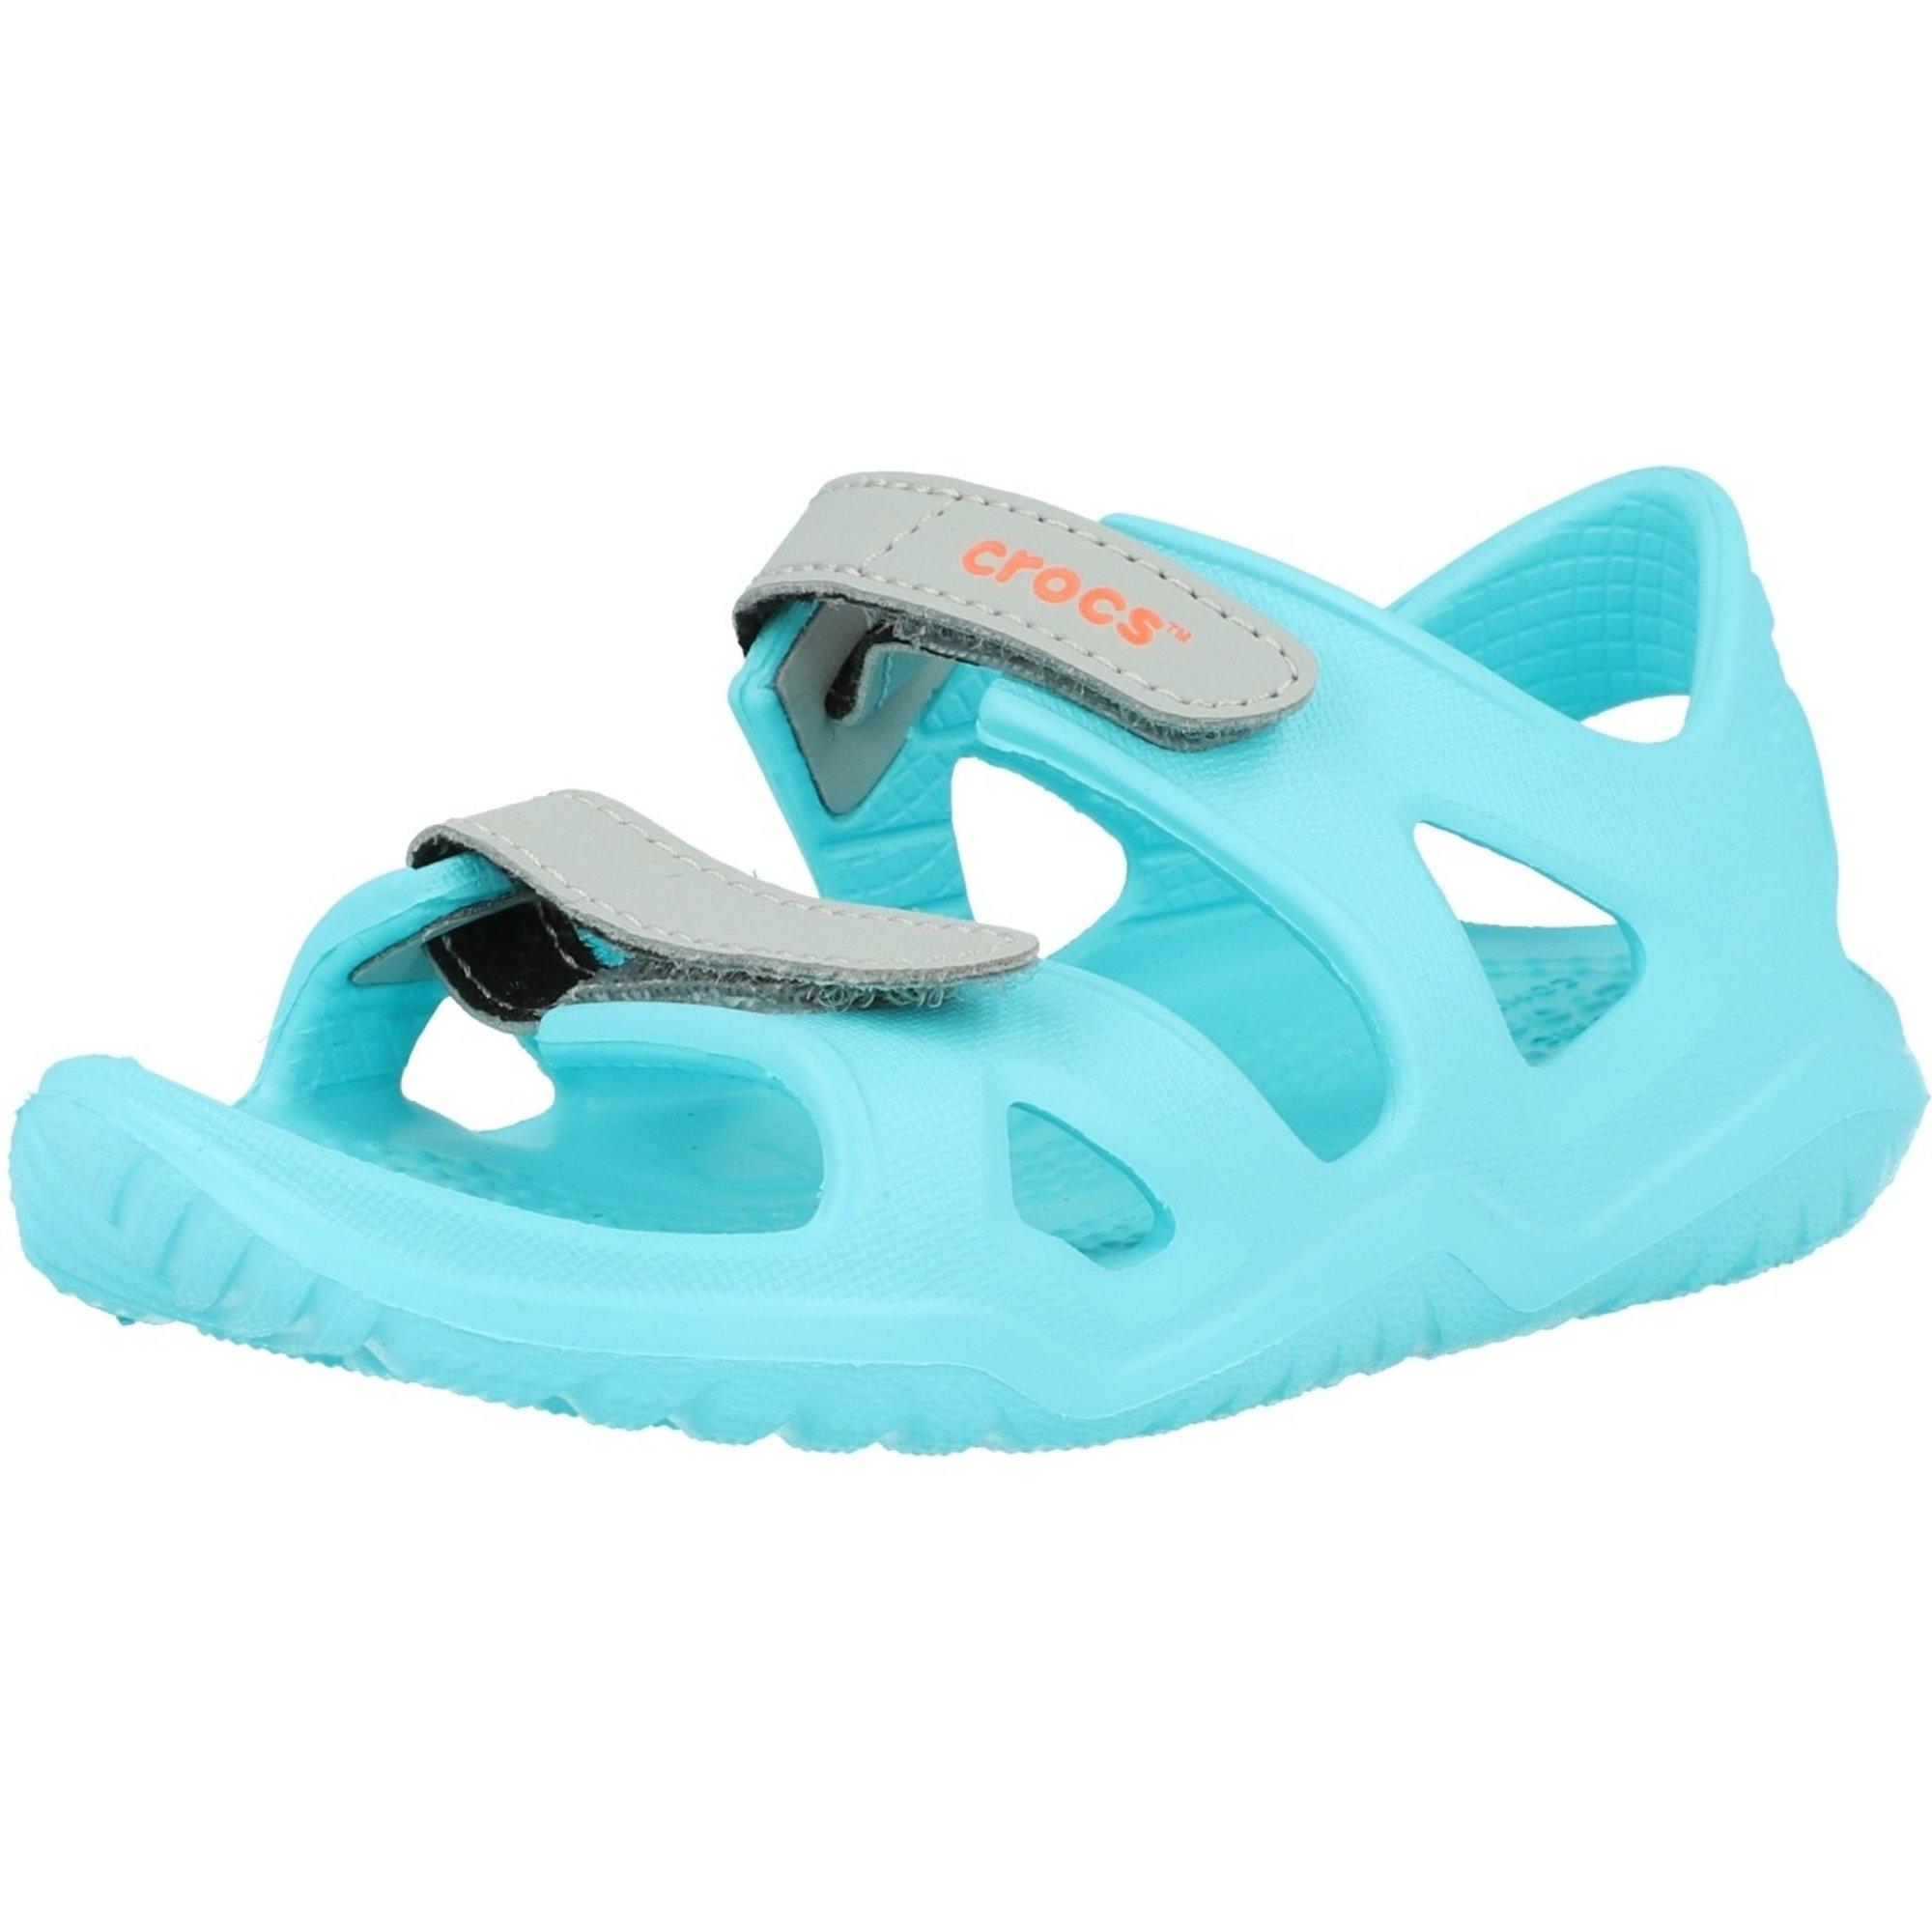 Crocs Swiftwater River Sandal K Pool Croslite Infant